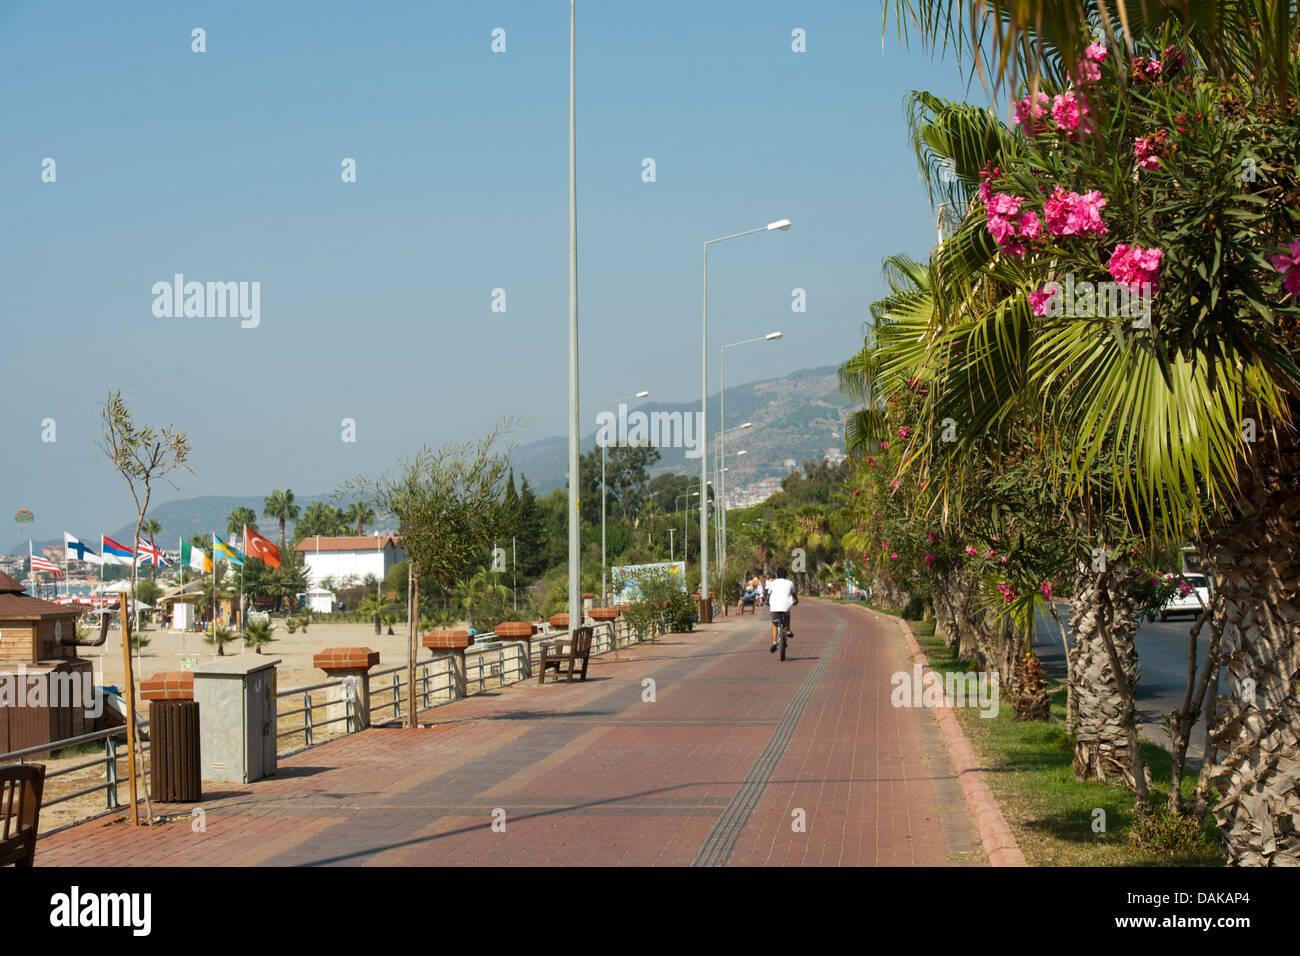 Türkei, Provinz Antalya, Alanya, Strandpromenade - Stock Image